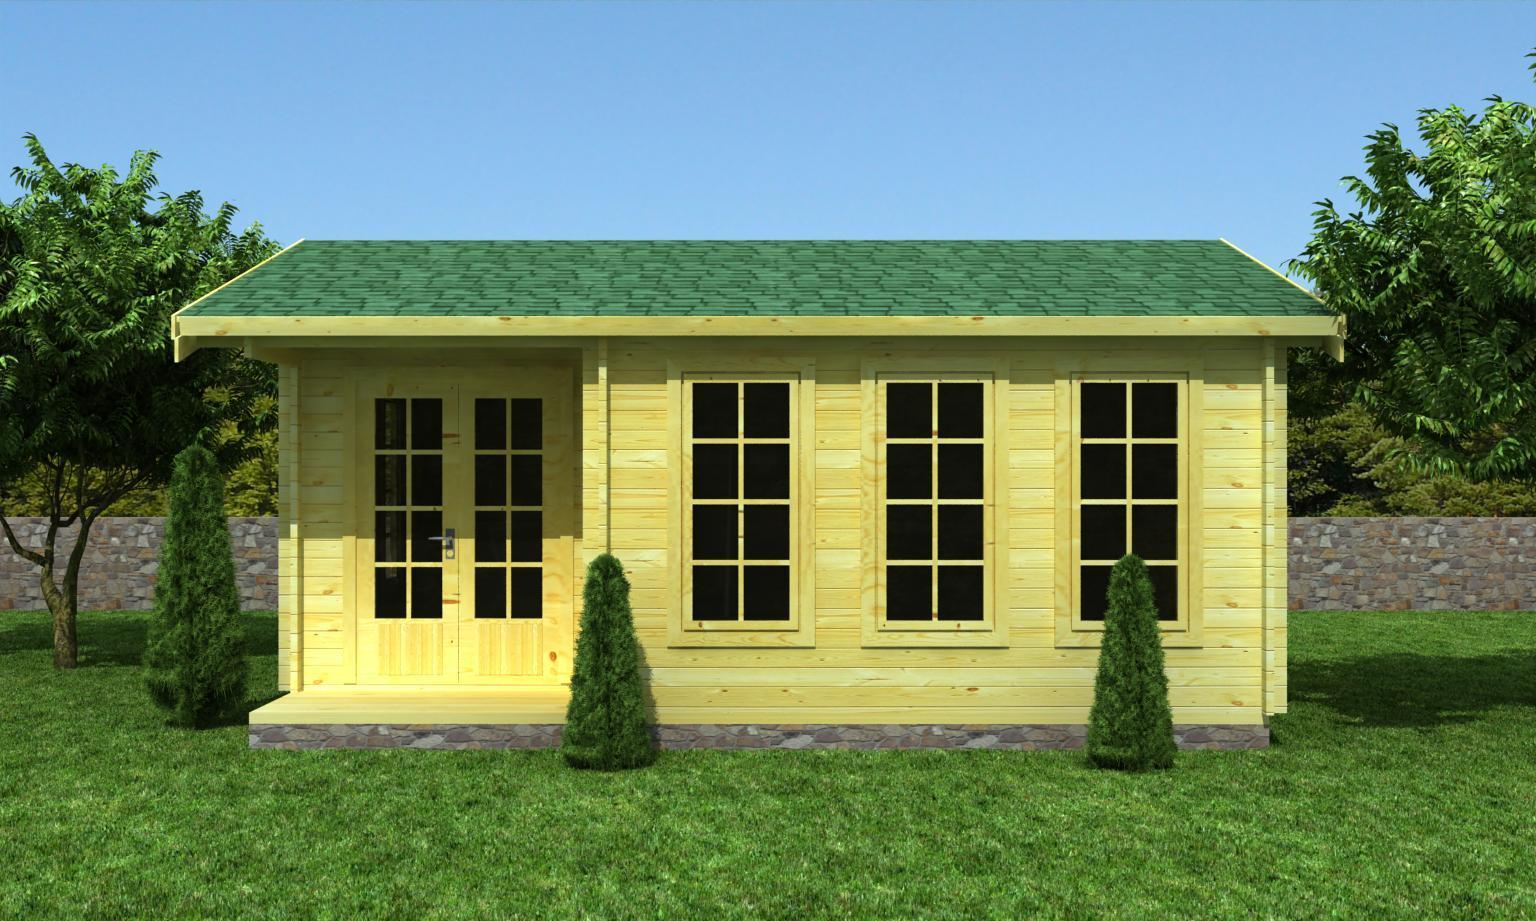 gartenhaus modell r dermark 44 sams gartenhaus shop. Black Bedroom Furniture Sets. Home Design Ideas